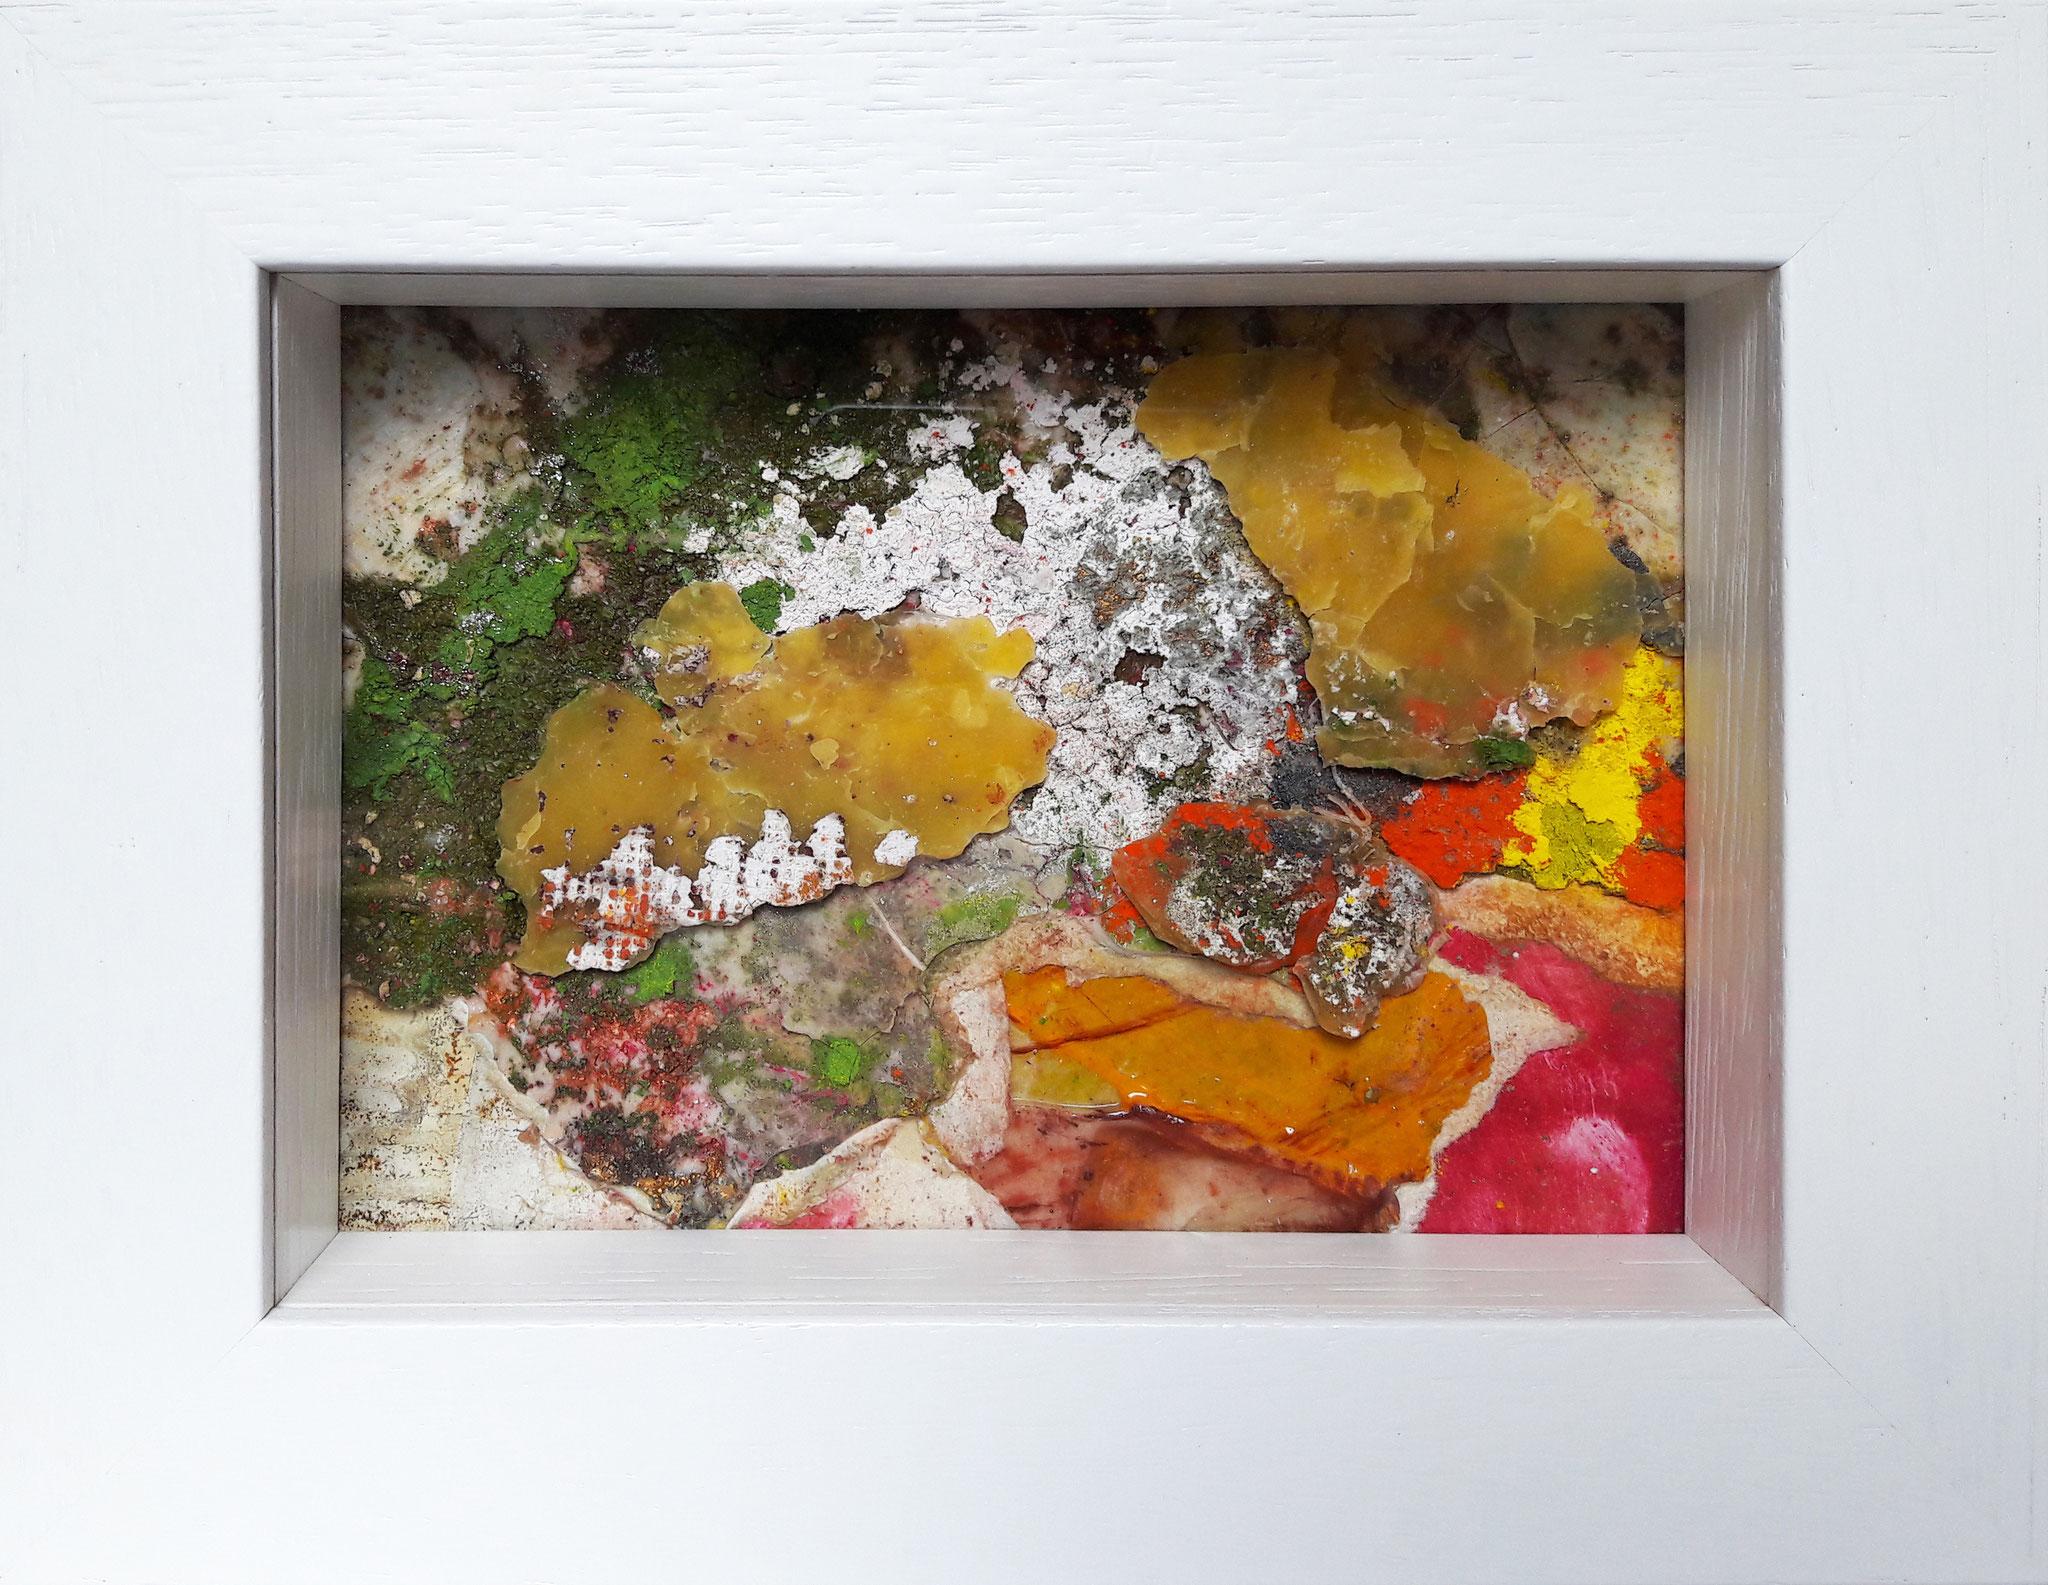 Papperlapapp 5, Acrylmischtechnik, 23 x 18 mit Rahmen, 2017,  verkauft